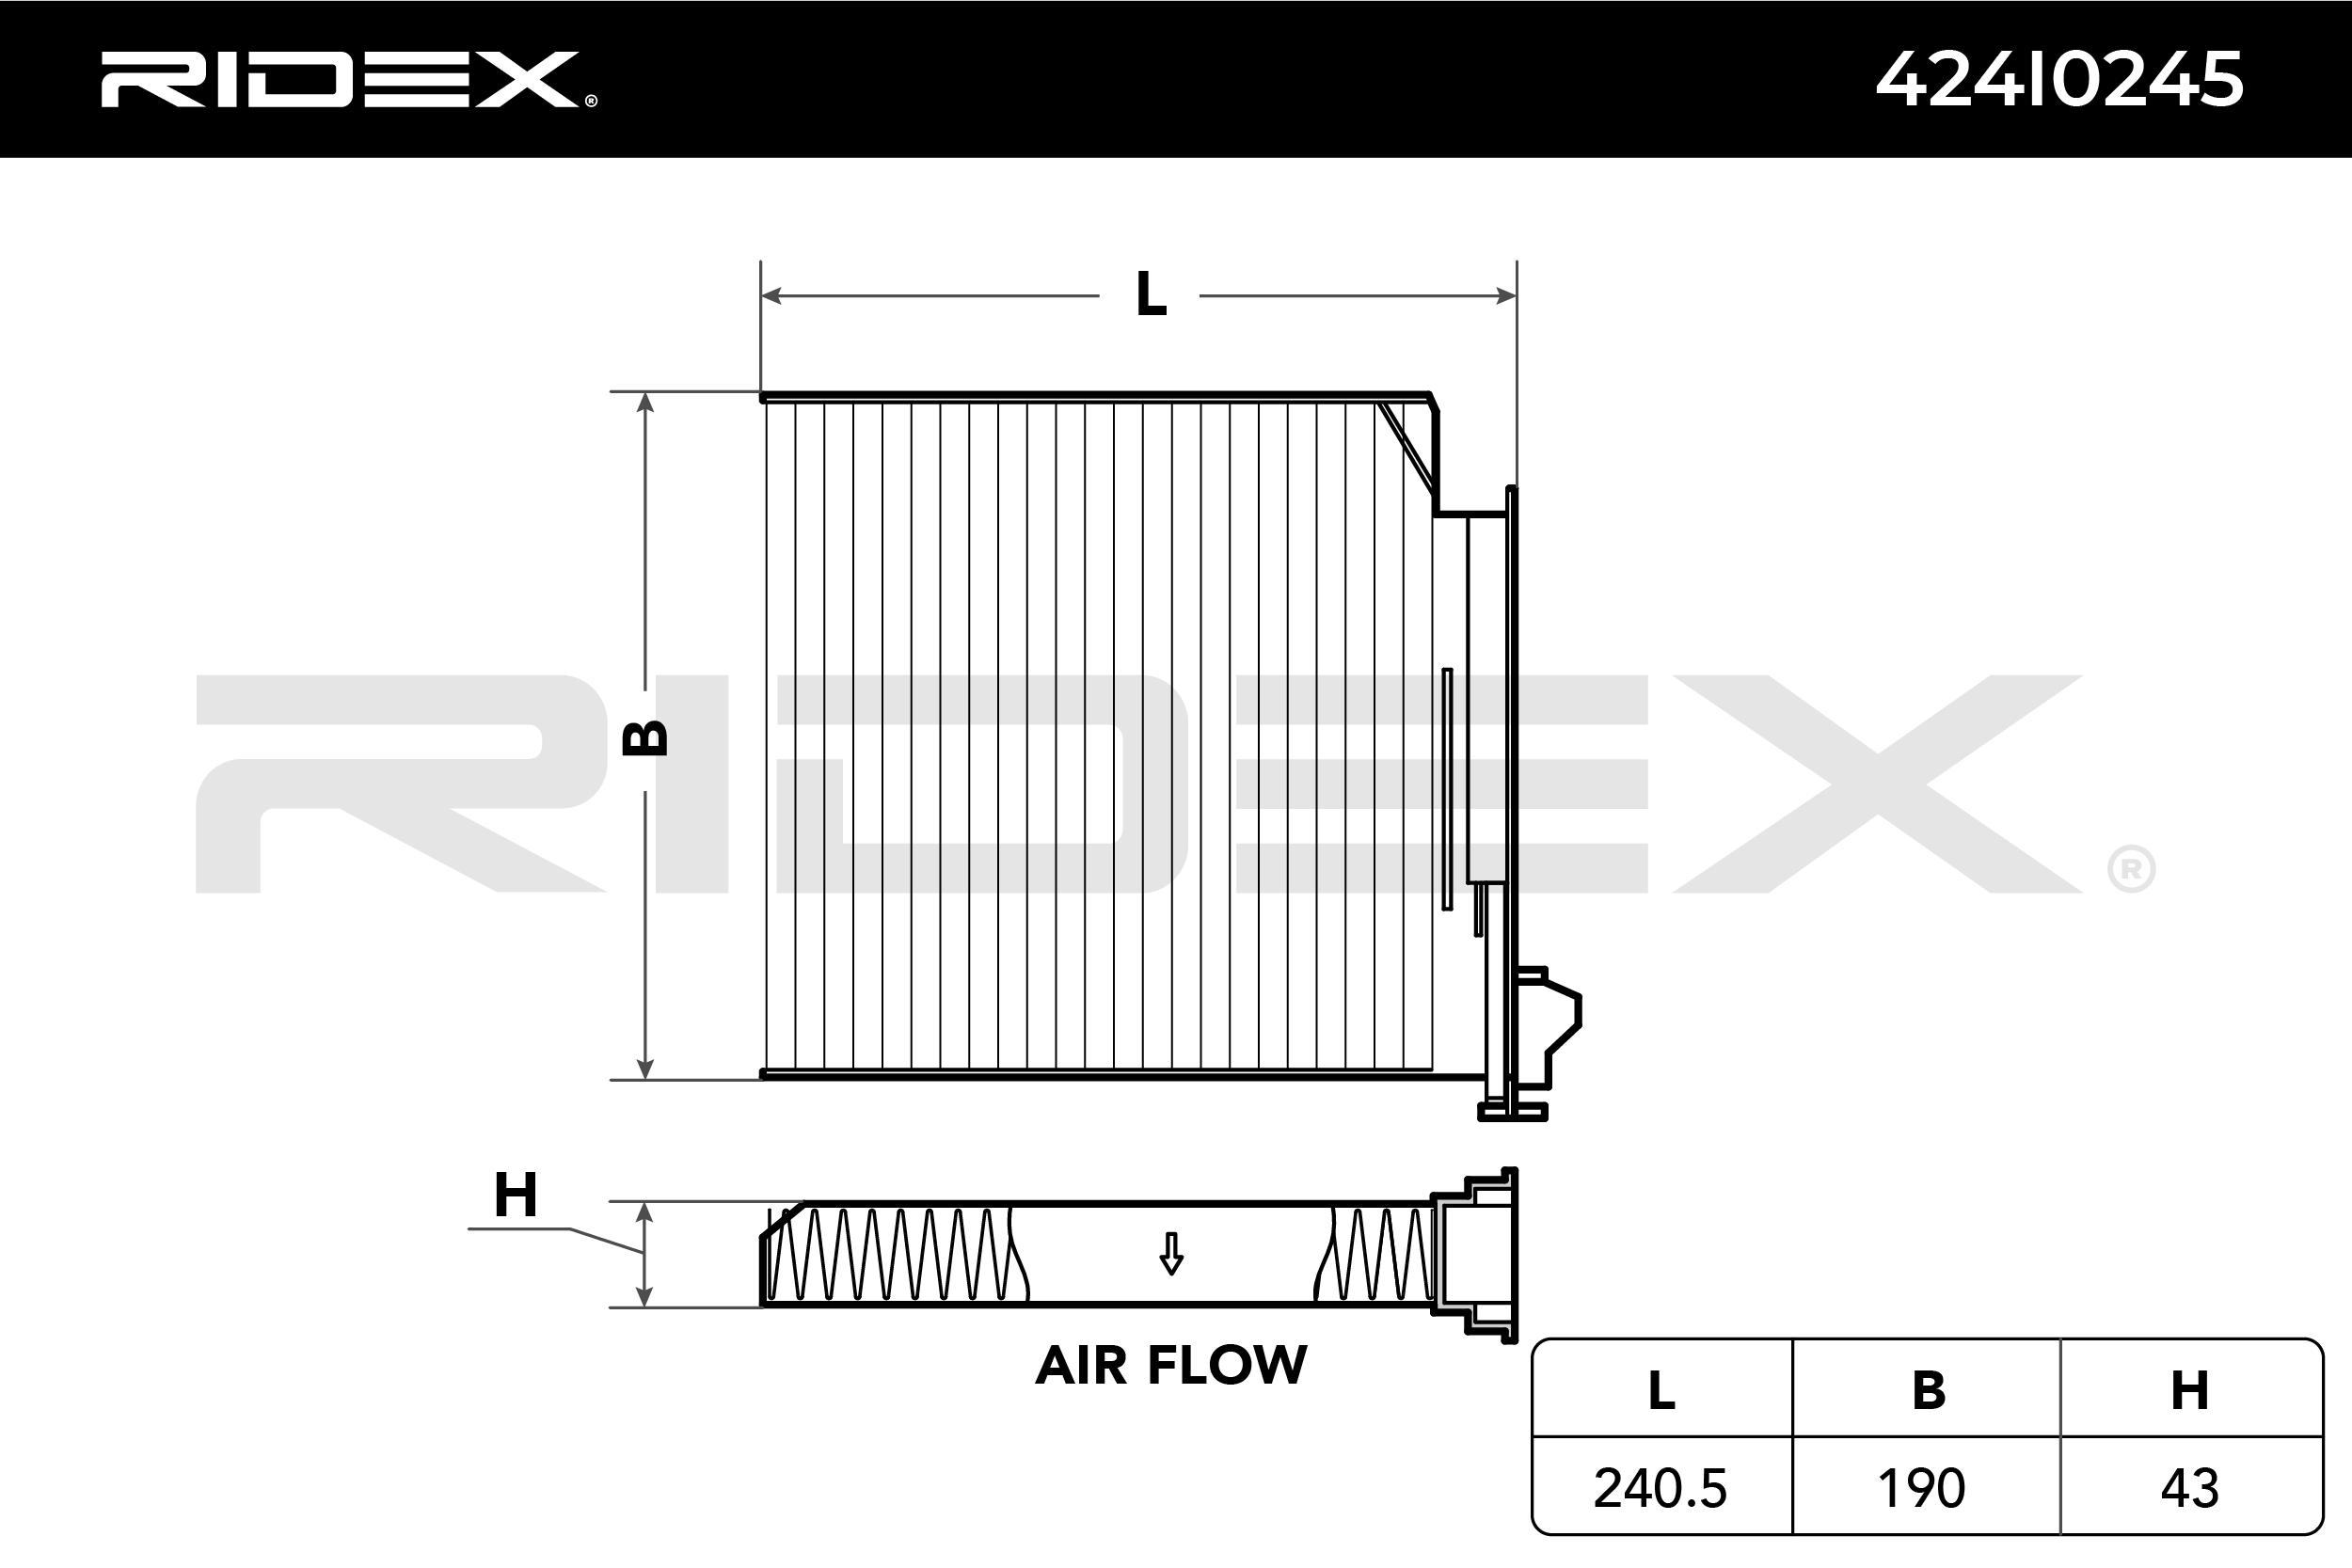 Innenraumfilter 424I0245 RIDEX 424I0245 in Original Qualität